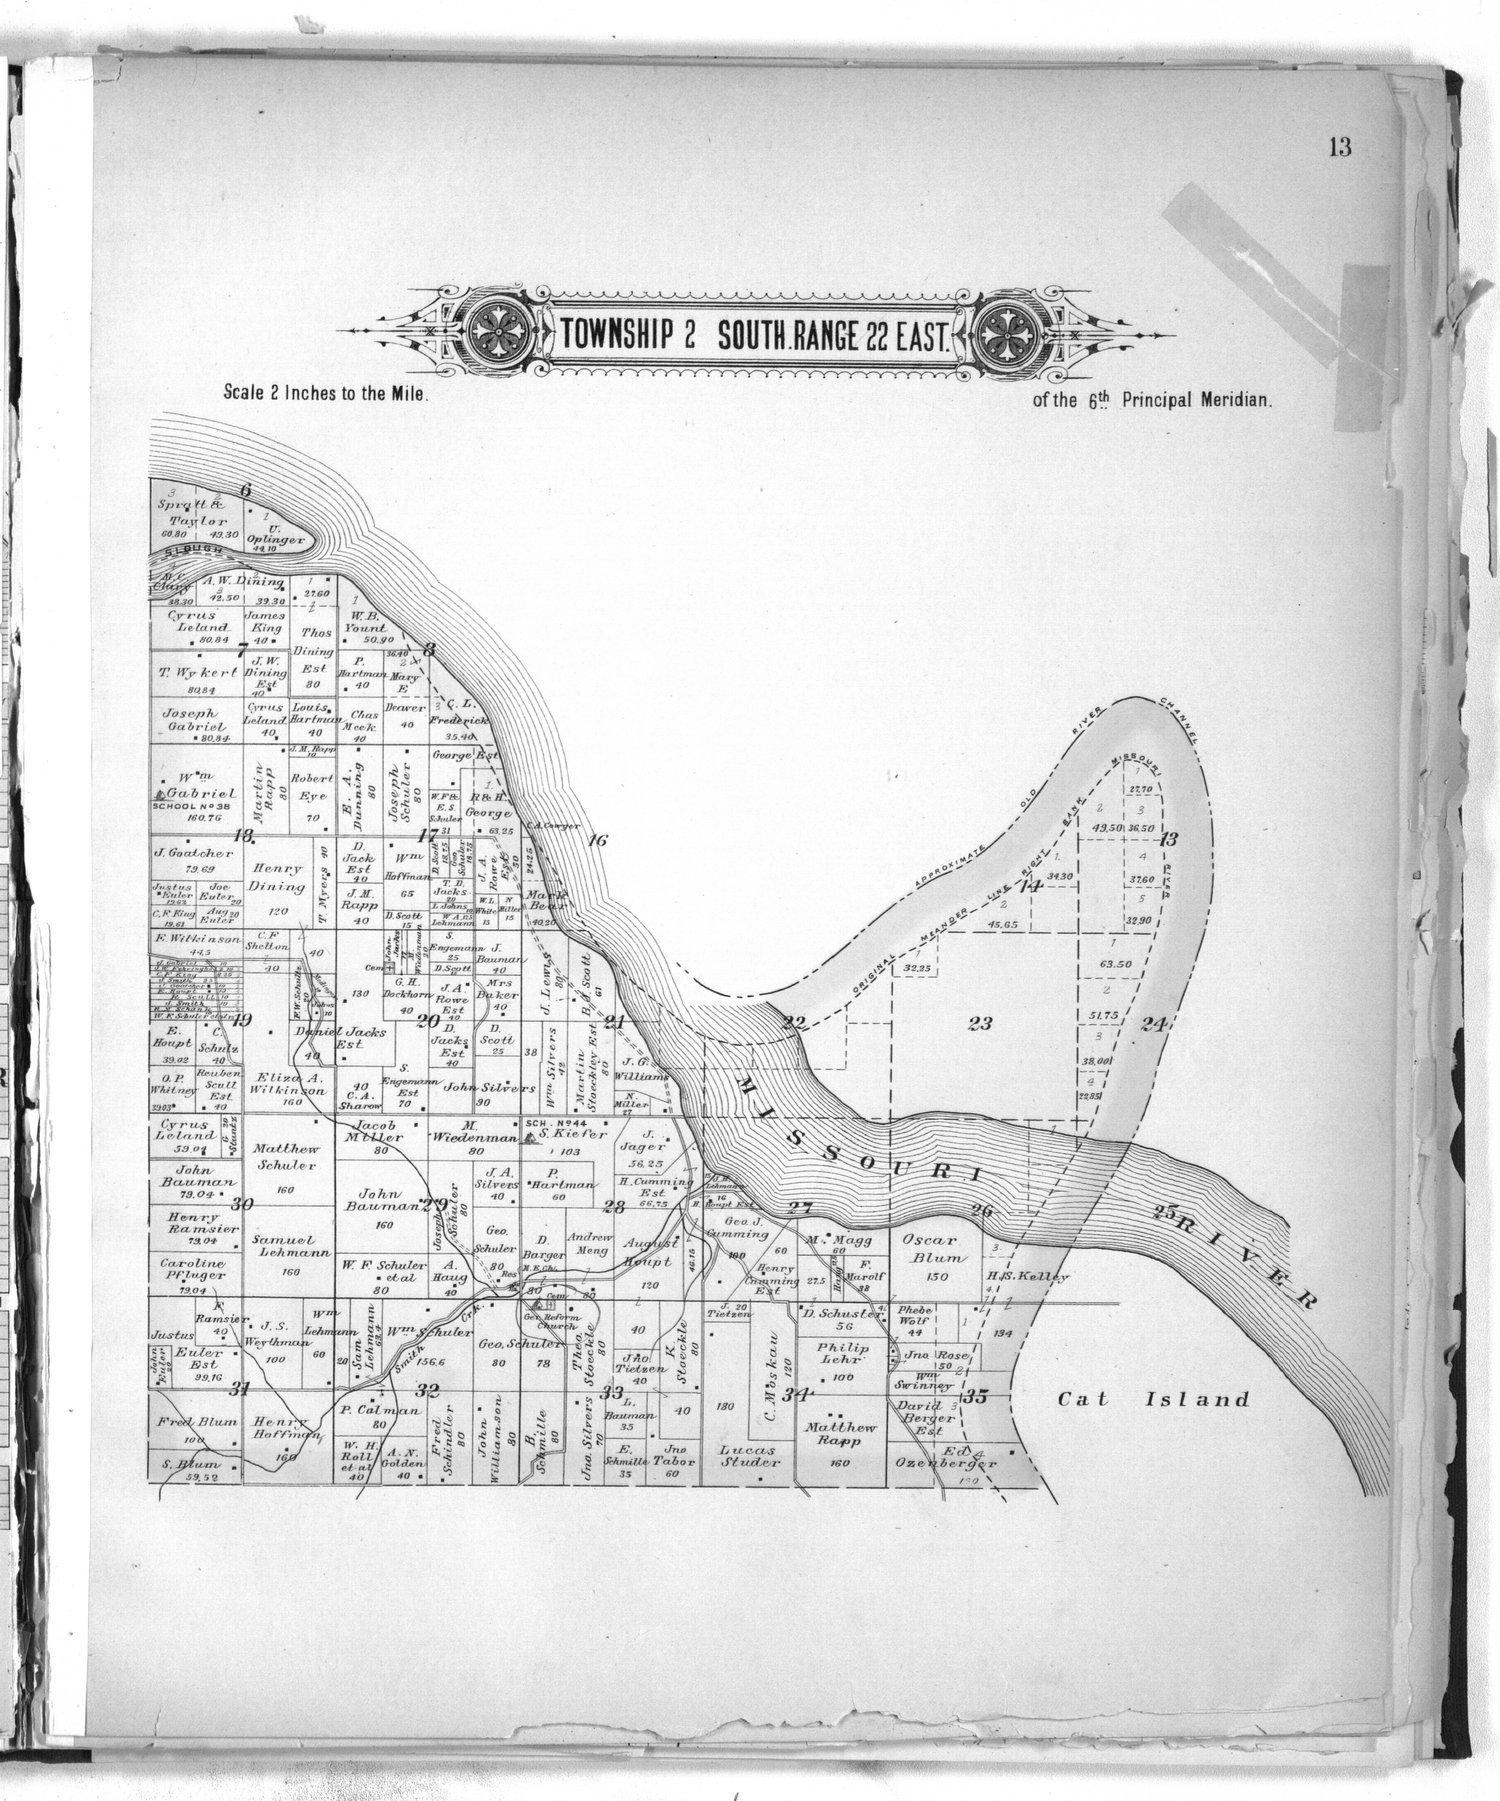 Plat book of Doniphan County, Kansas - 13